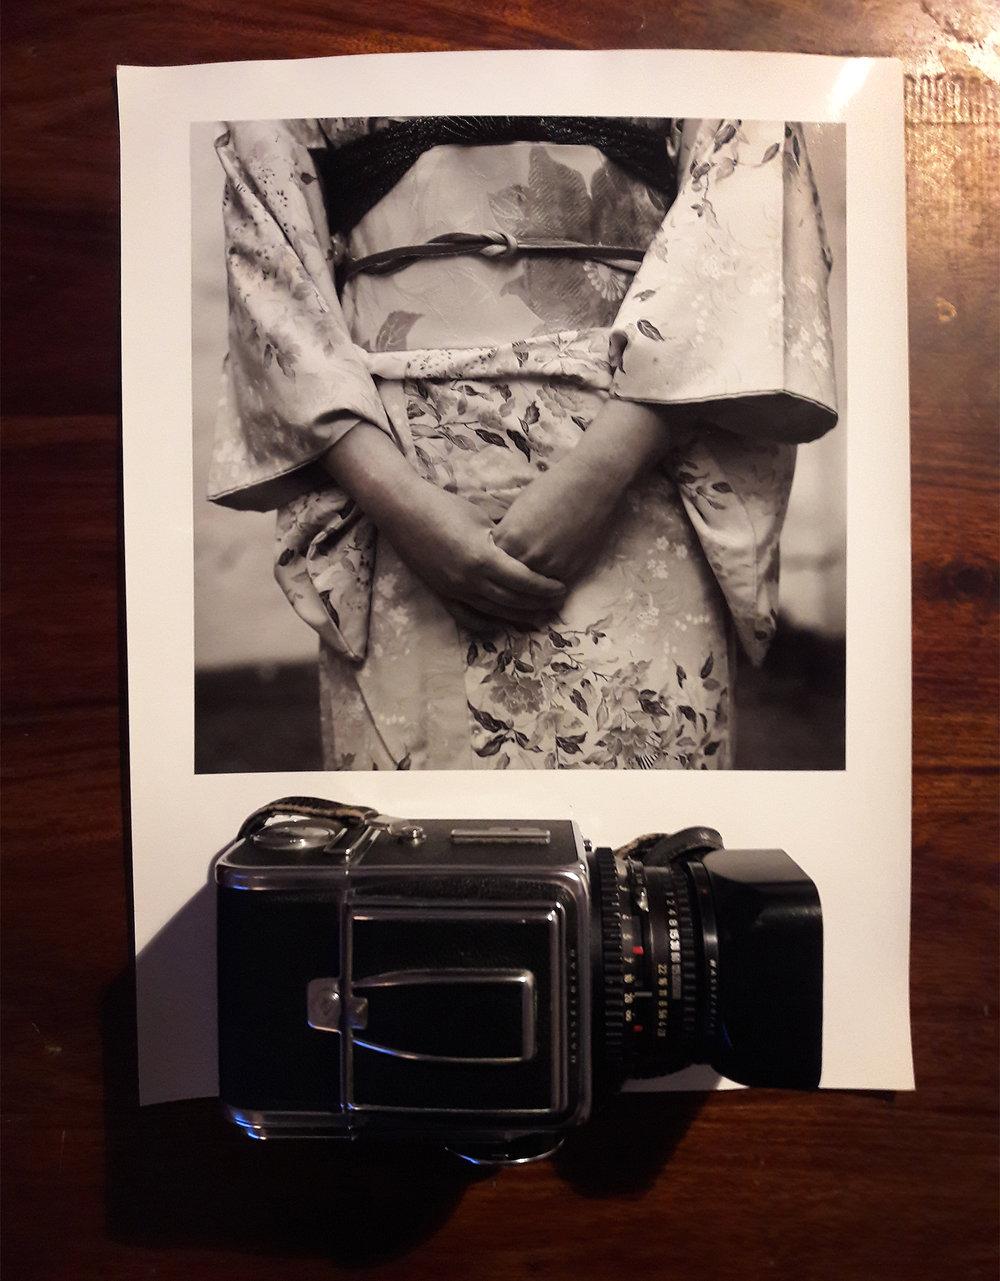 Giacomo Frullani | Kanazawa | Hasselblad 500 - 120mm | Delta 400